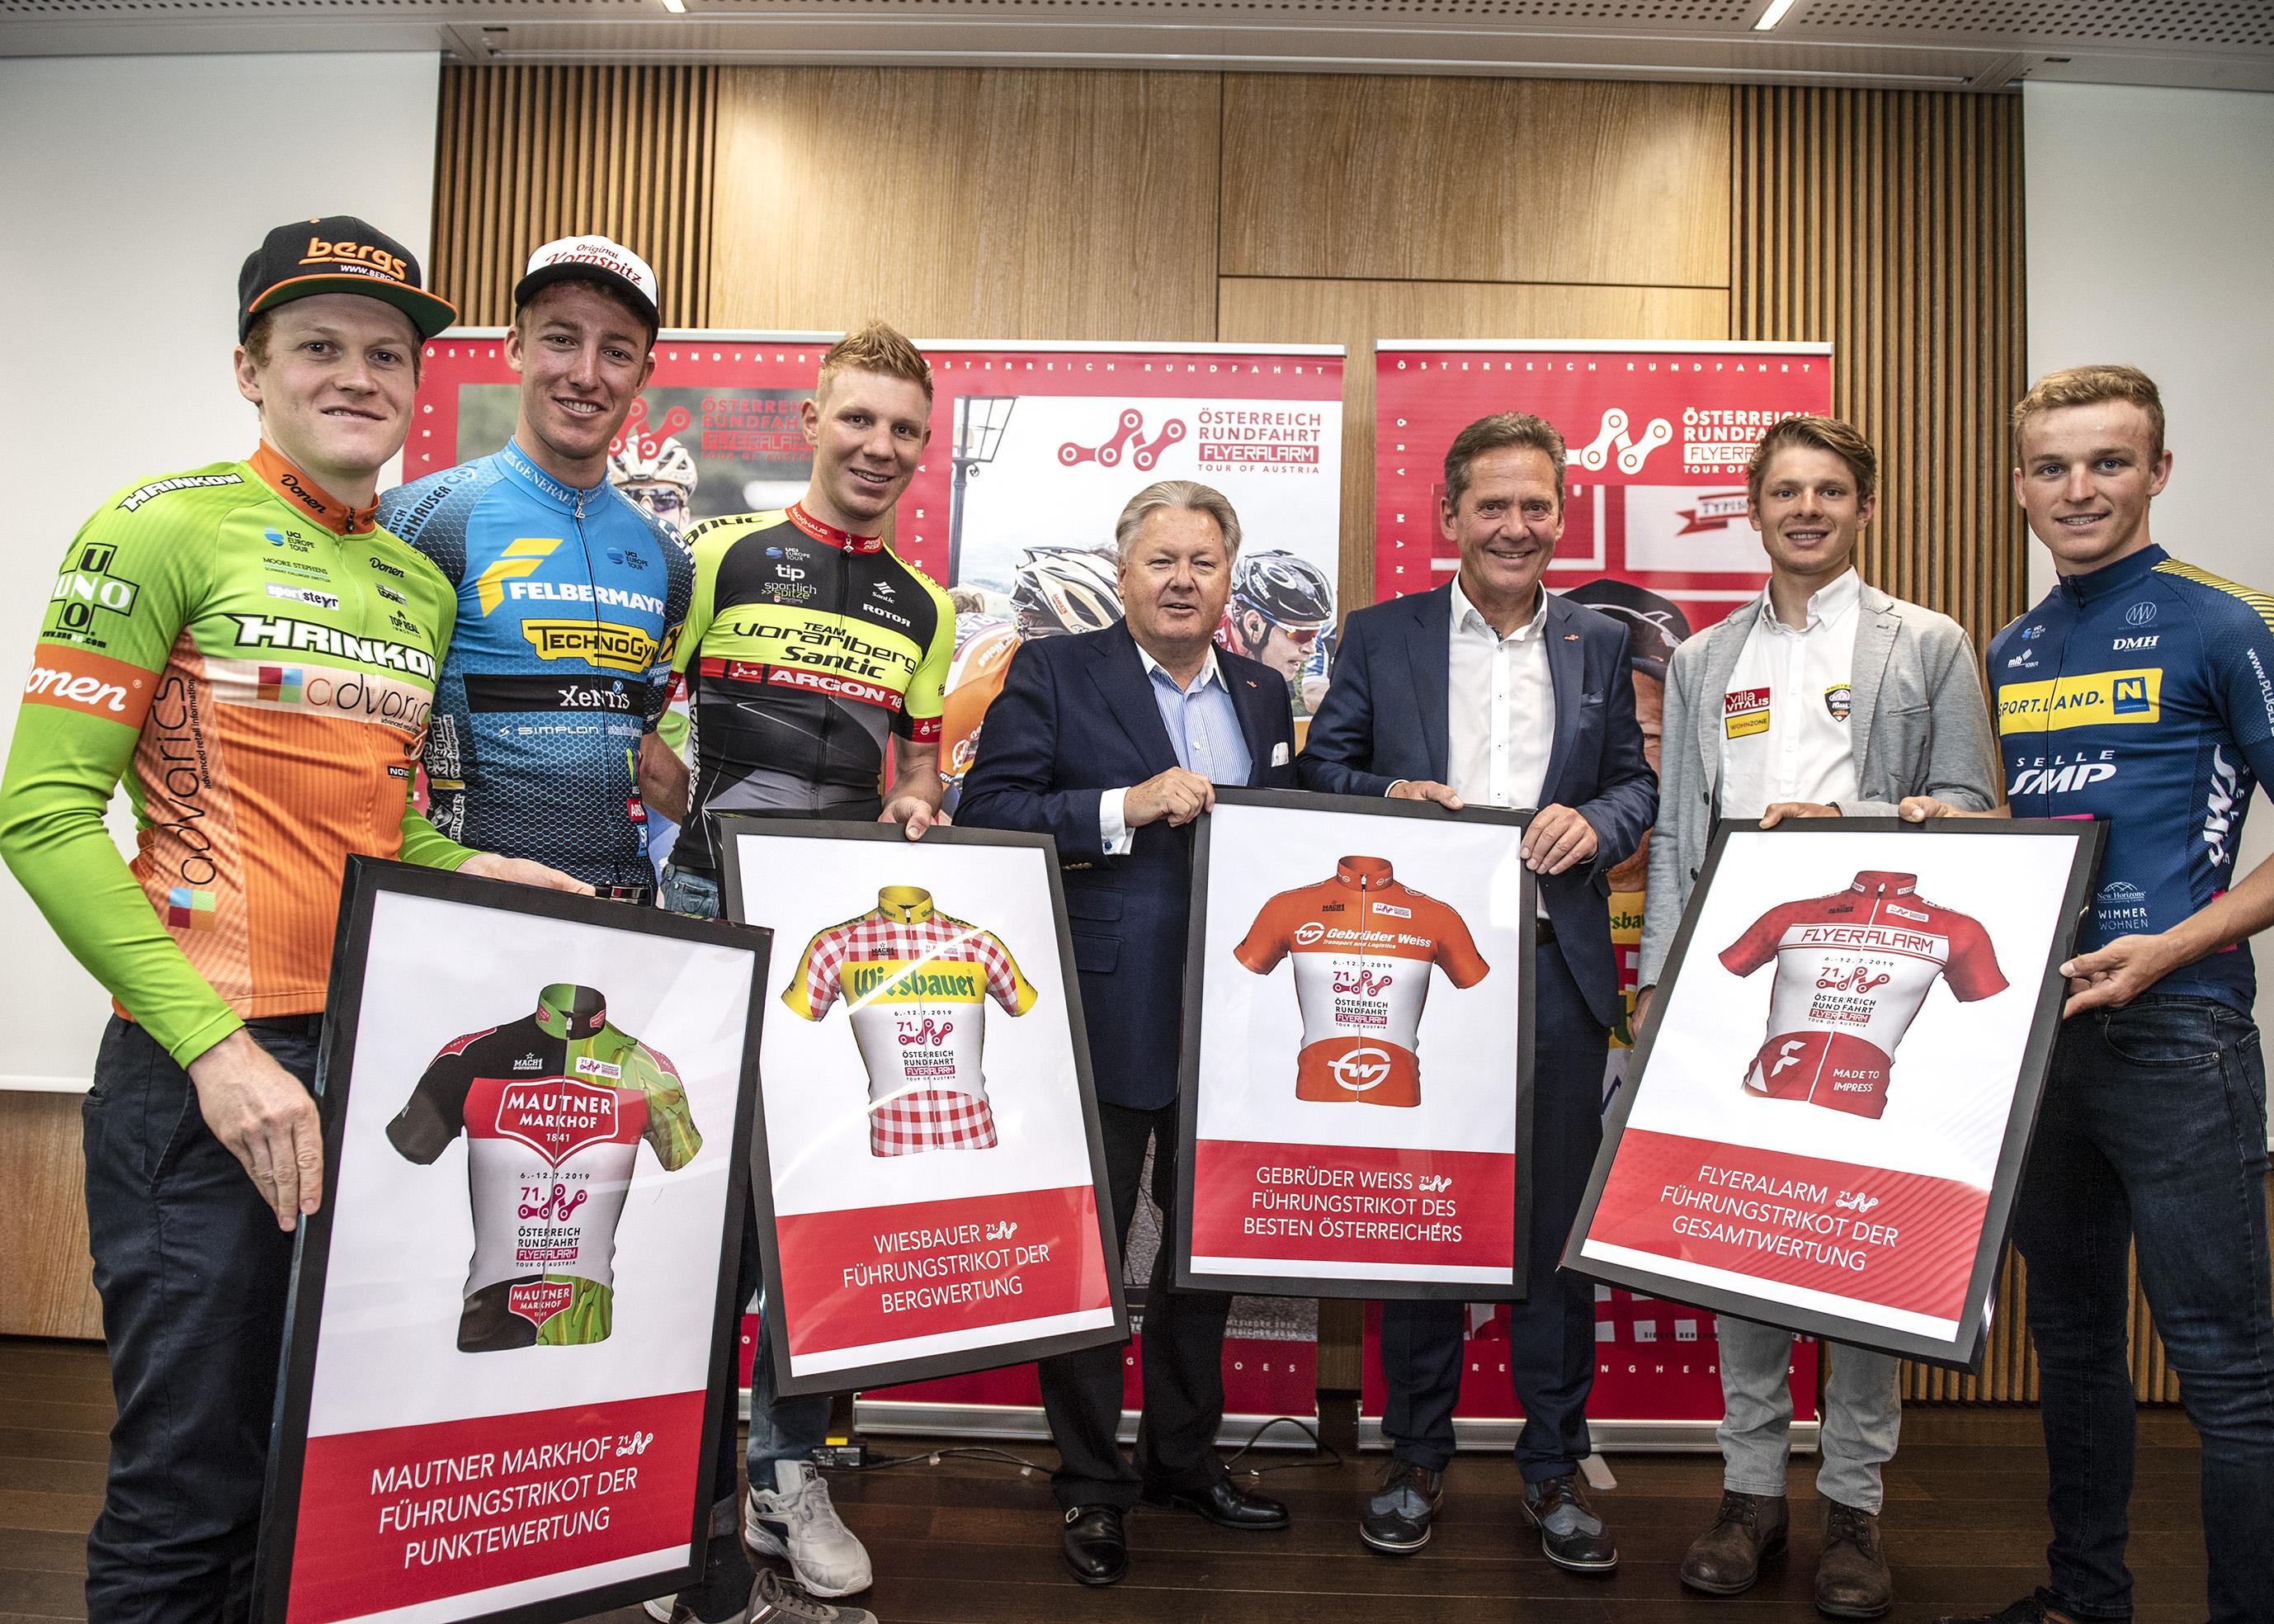 v.l.n.r.: Dominik Hrinkow (Hrinkow Advarics Cycleang Team), Florian Kierner (Team Felbermayr Simplon Wels), Daniel Geismayr (Team Vorarlberg Santic), Harald Mayer (ÖRV Präsident), Franz Steinberger (Tourdirektor), Sebastian Schönberger (Neri Sottoli - Selle Italia - KTM), Thomas Umhaller (SPORT.LAND. Niederösterreich Selle SMP - St. Rich)